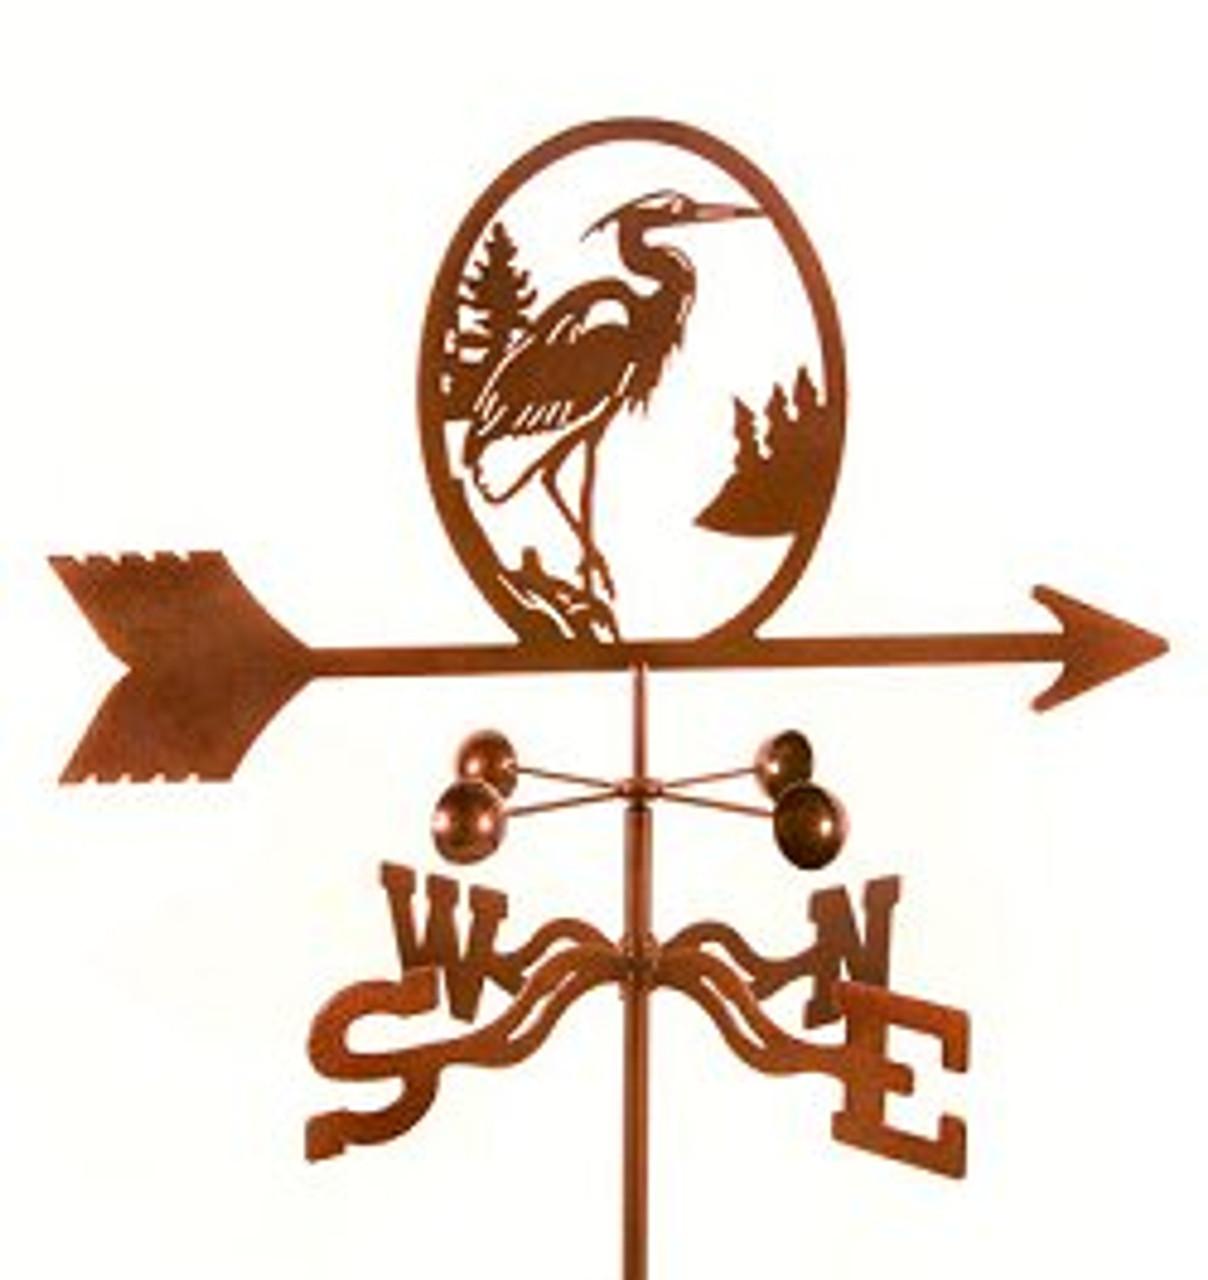 Bird-Heron Weathervane with mount